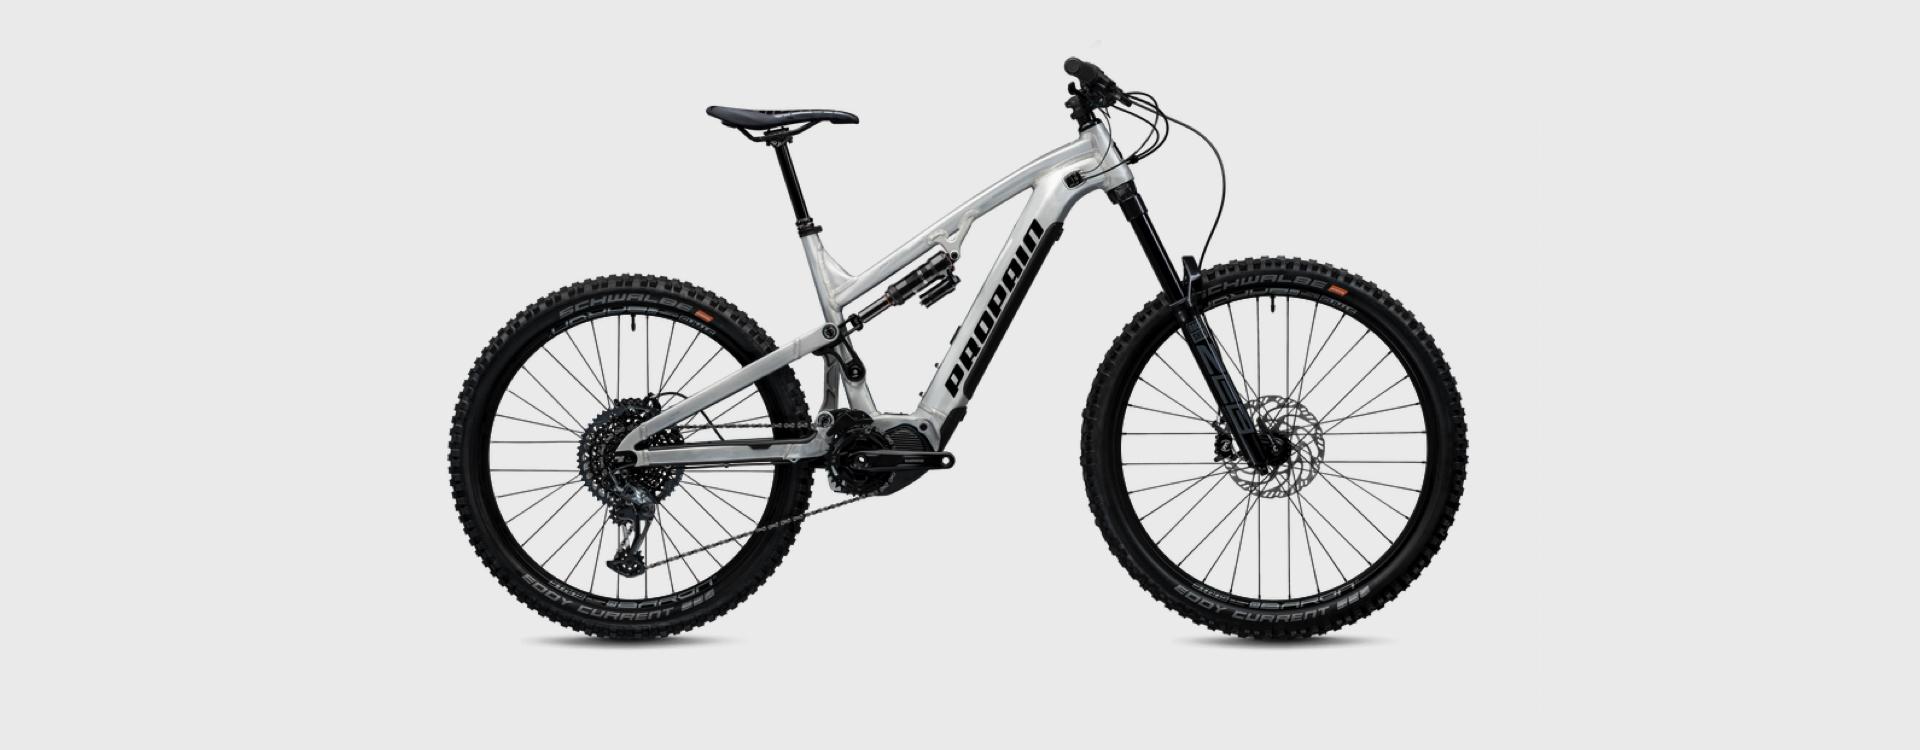 Bike Verleih Gummersbach Propain Bikes Testcenter NRW Ekano 5 - AL - M - 29 - Raw - 1920x750